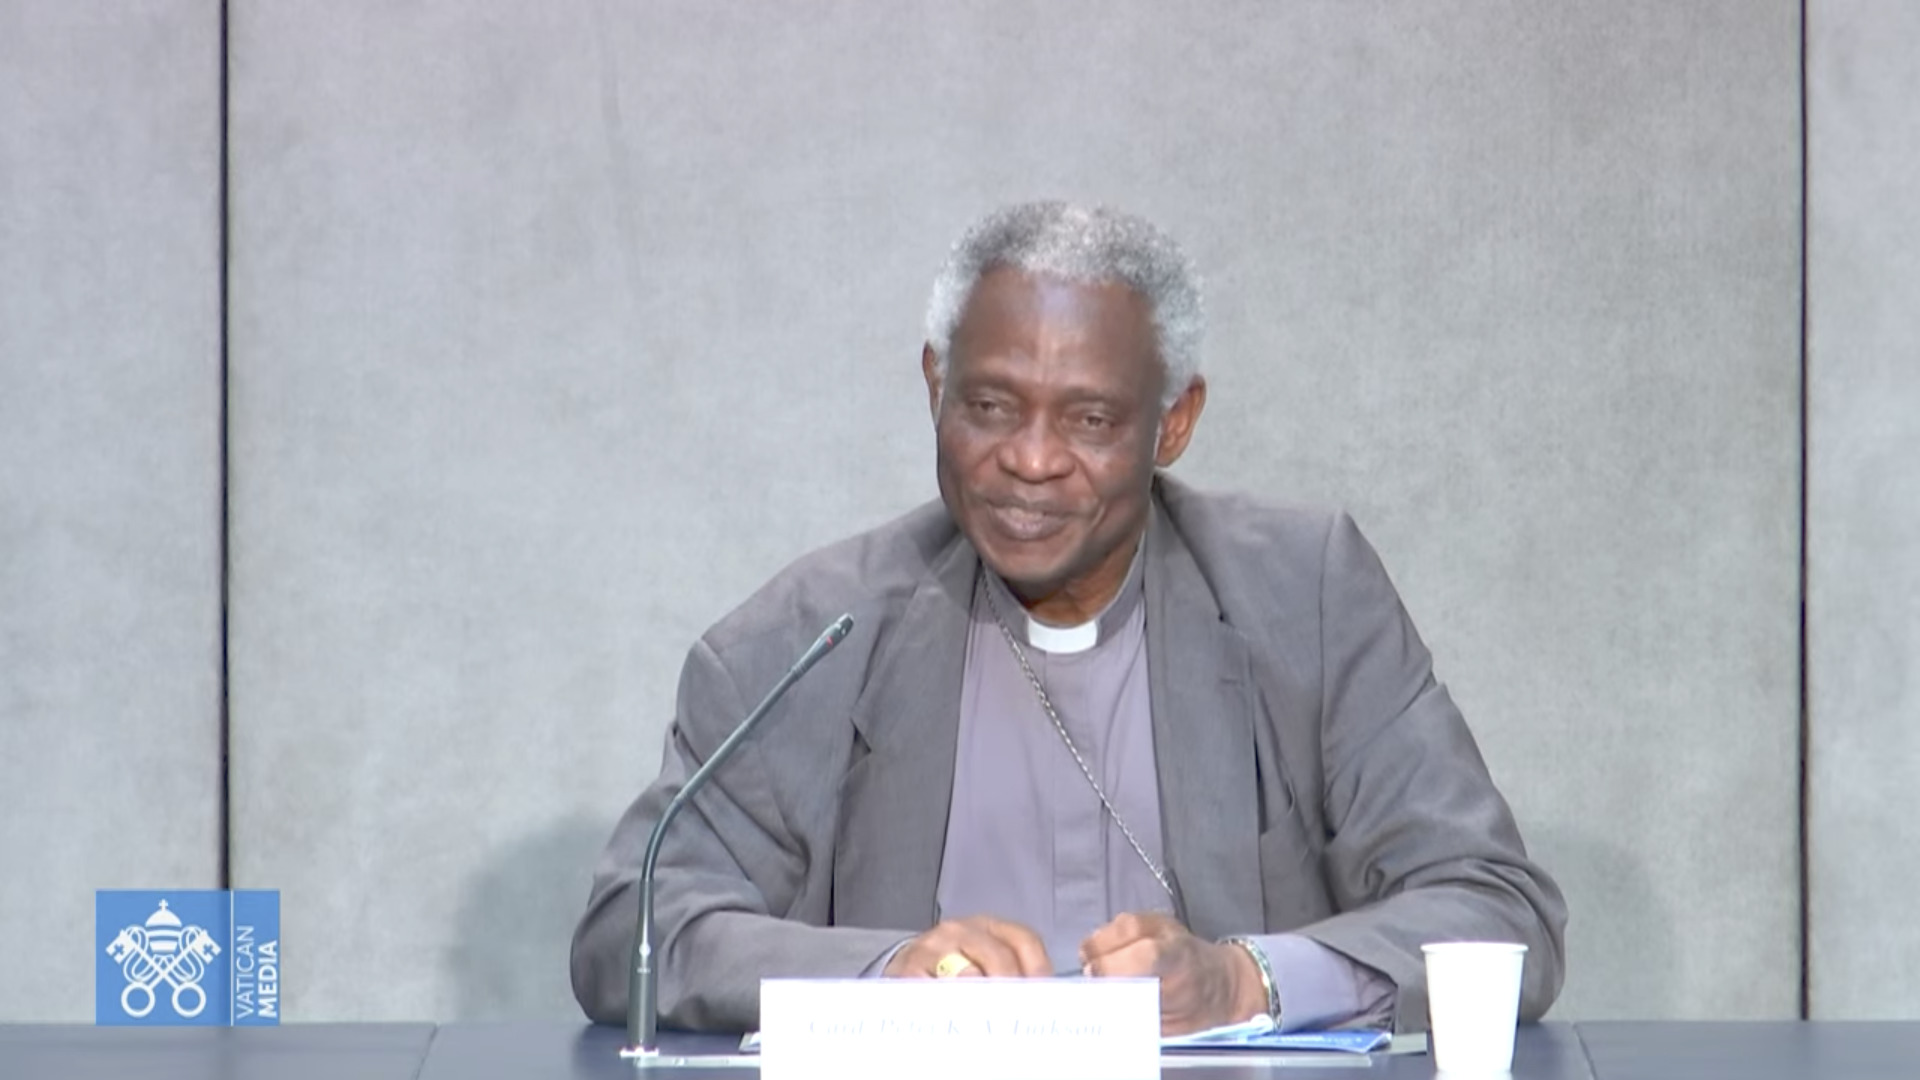 Card. Turkson, capture @ Vatican Media